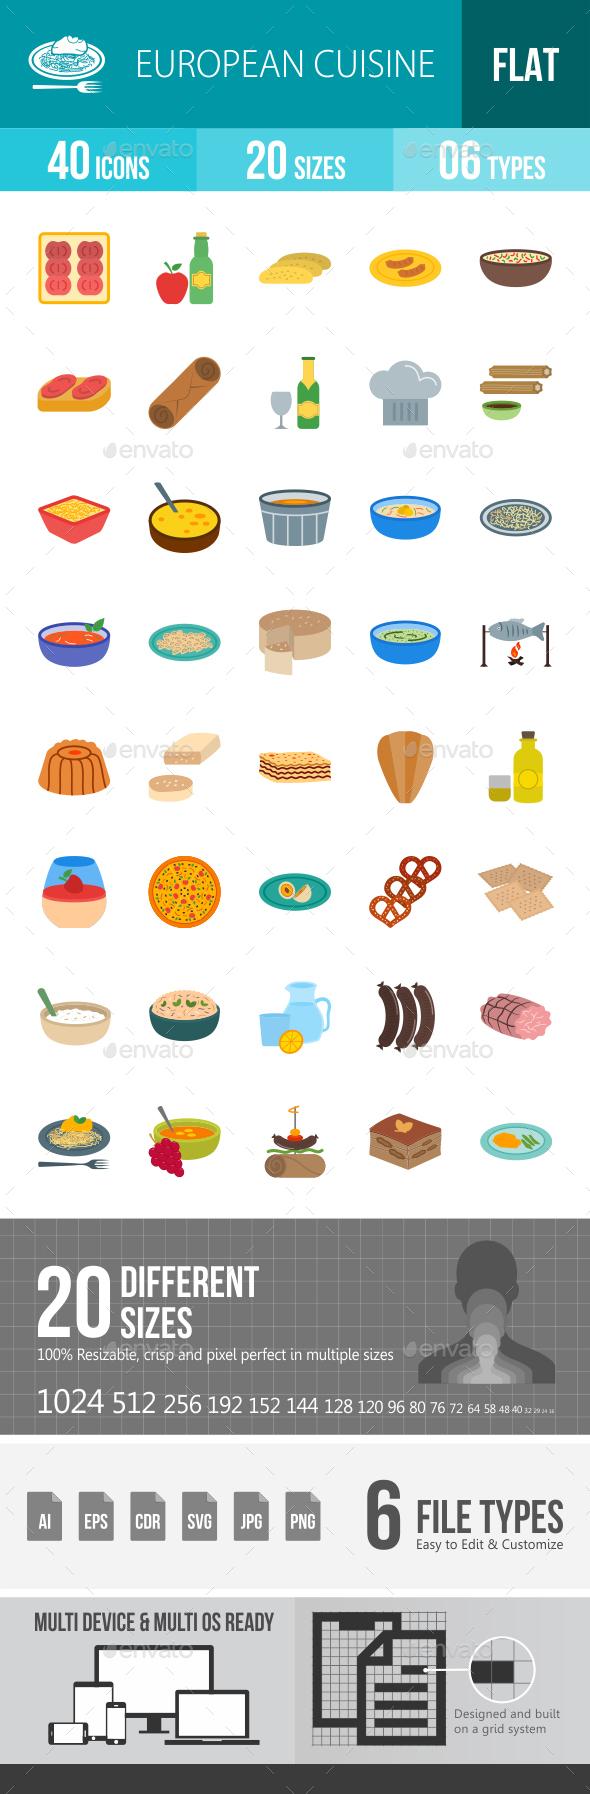 European Cuisine Flat Multicolor Icons - Icons